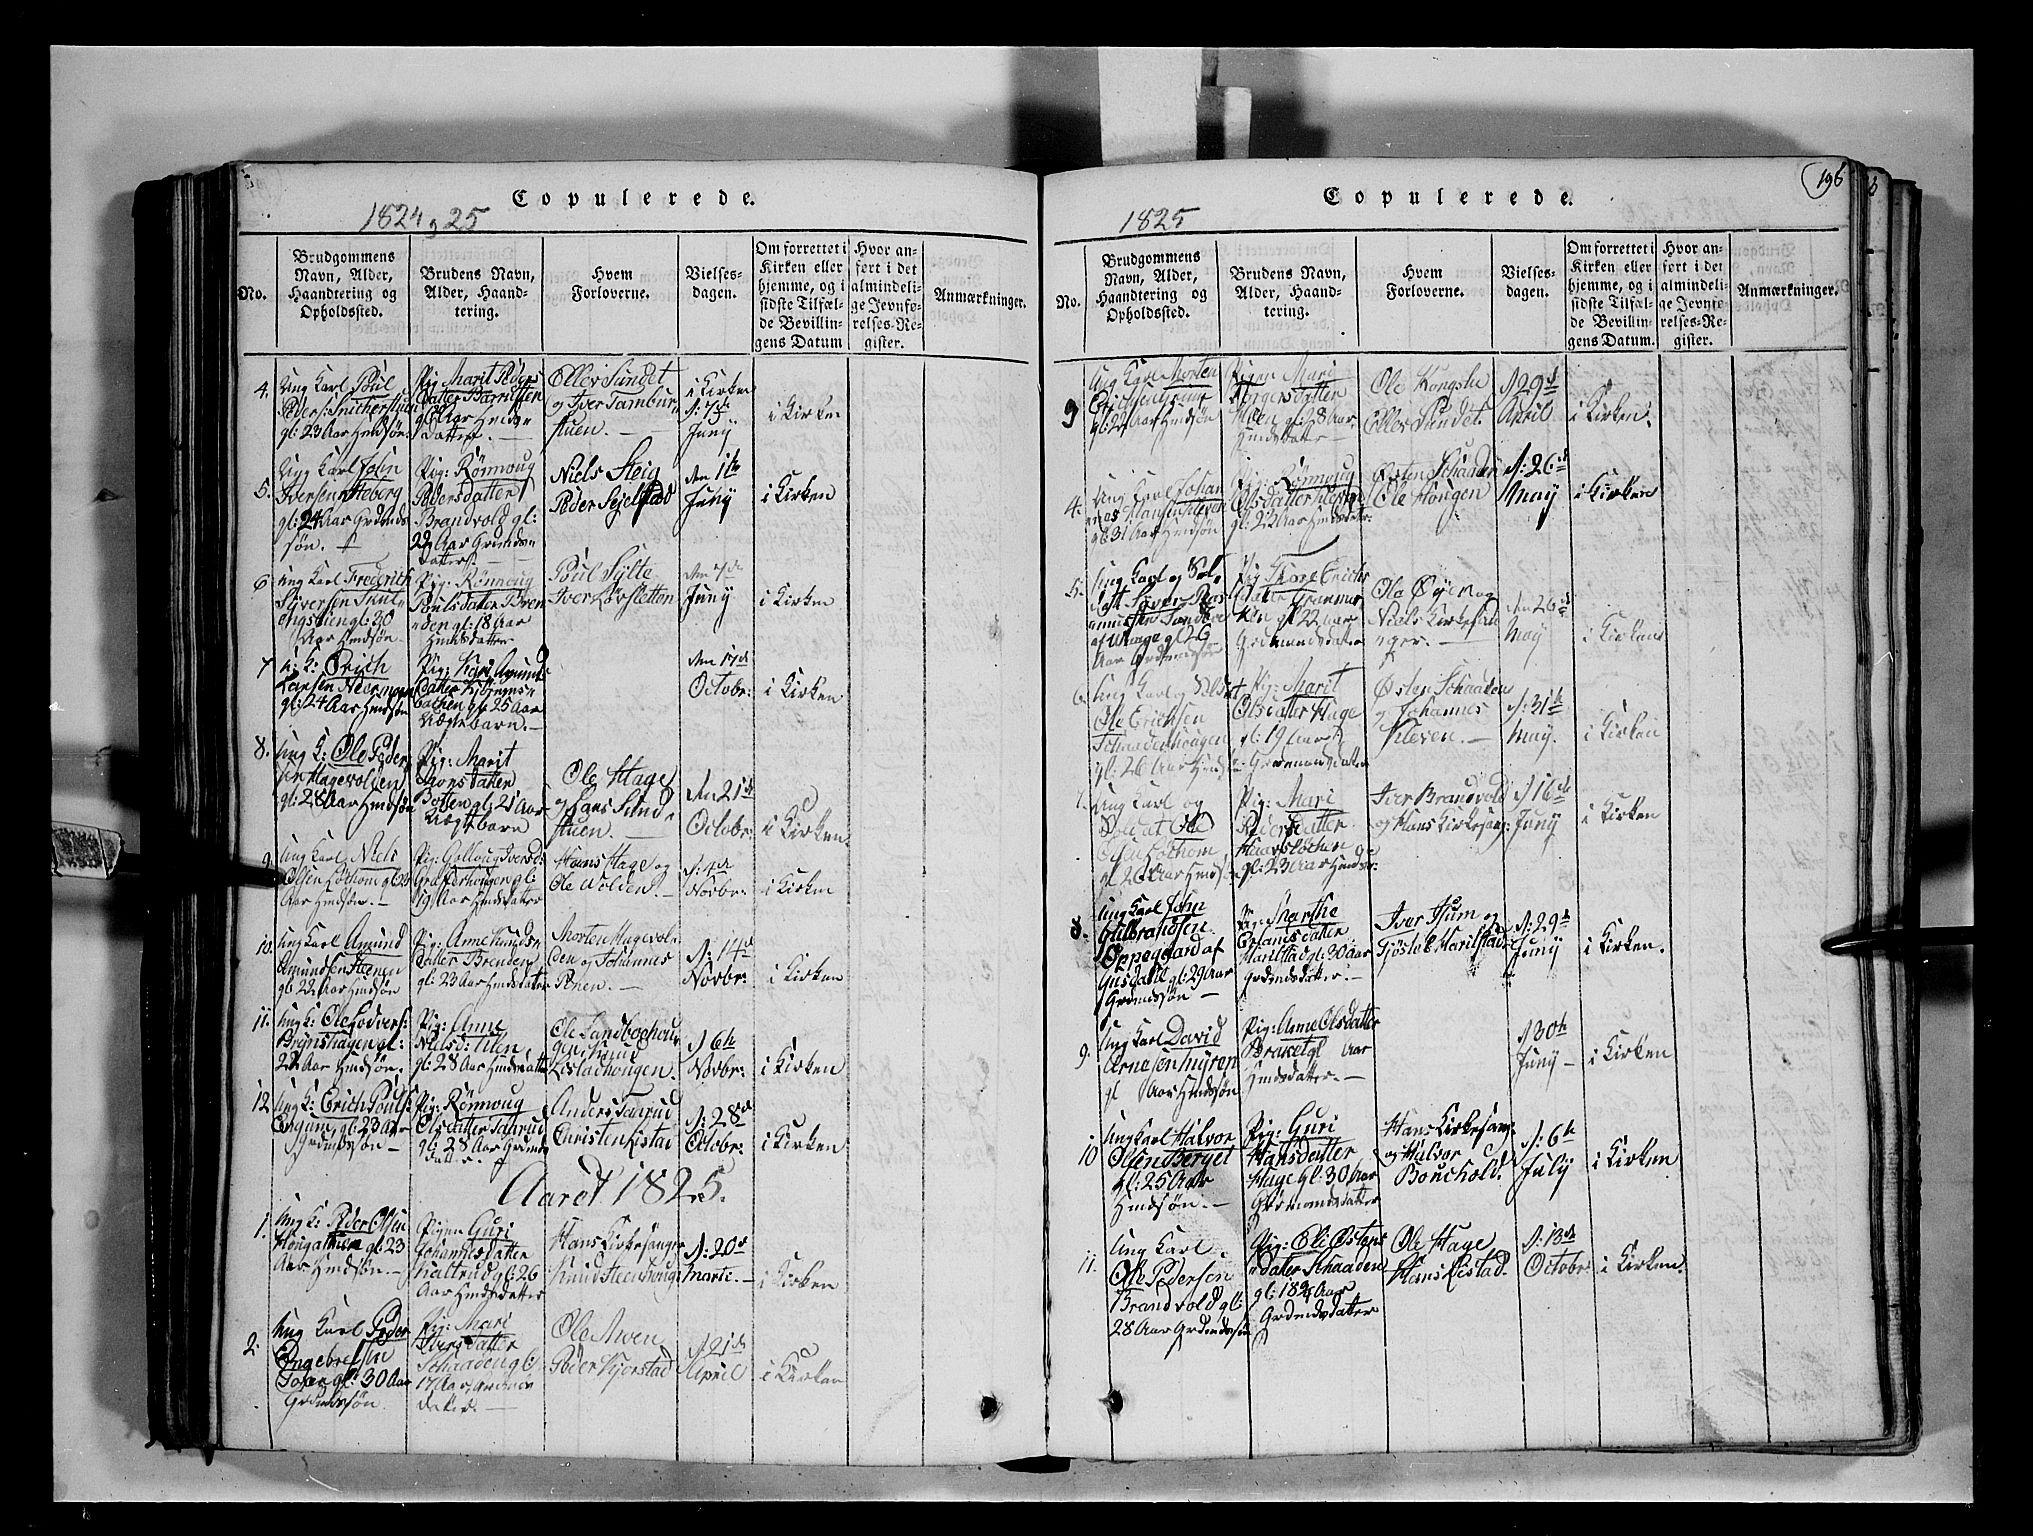 SAH, Fron prestekontor, H/Ha/Hab/L0004: Klokkerbok nr. 4, 1816-1850, s. 198